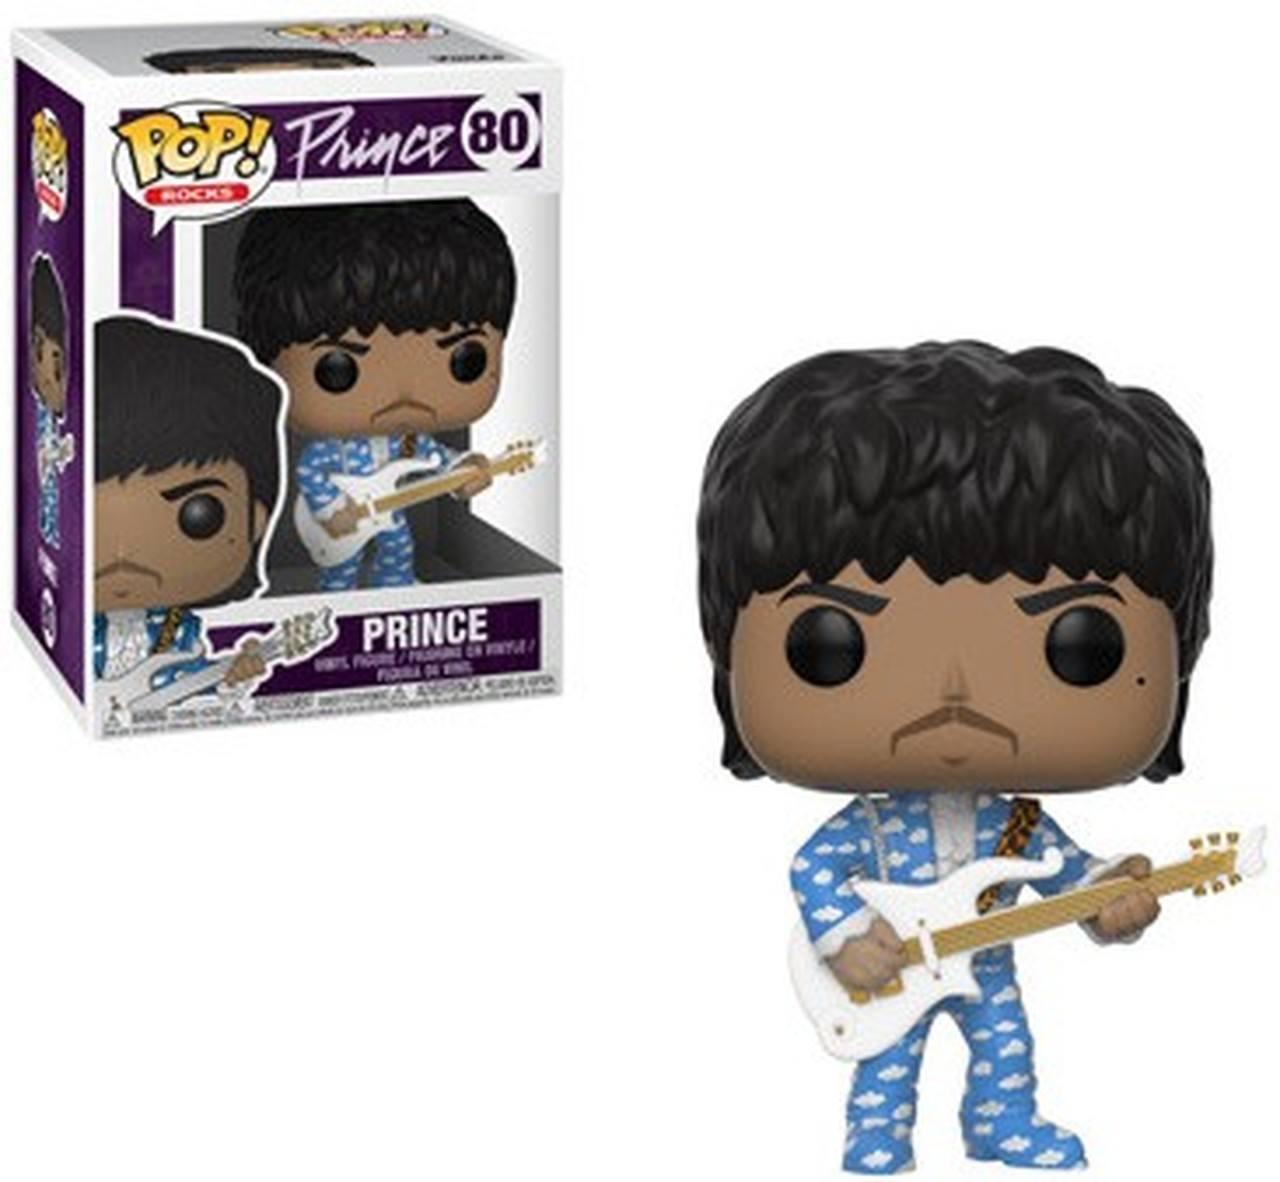 Prince - Funko Pop!